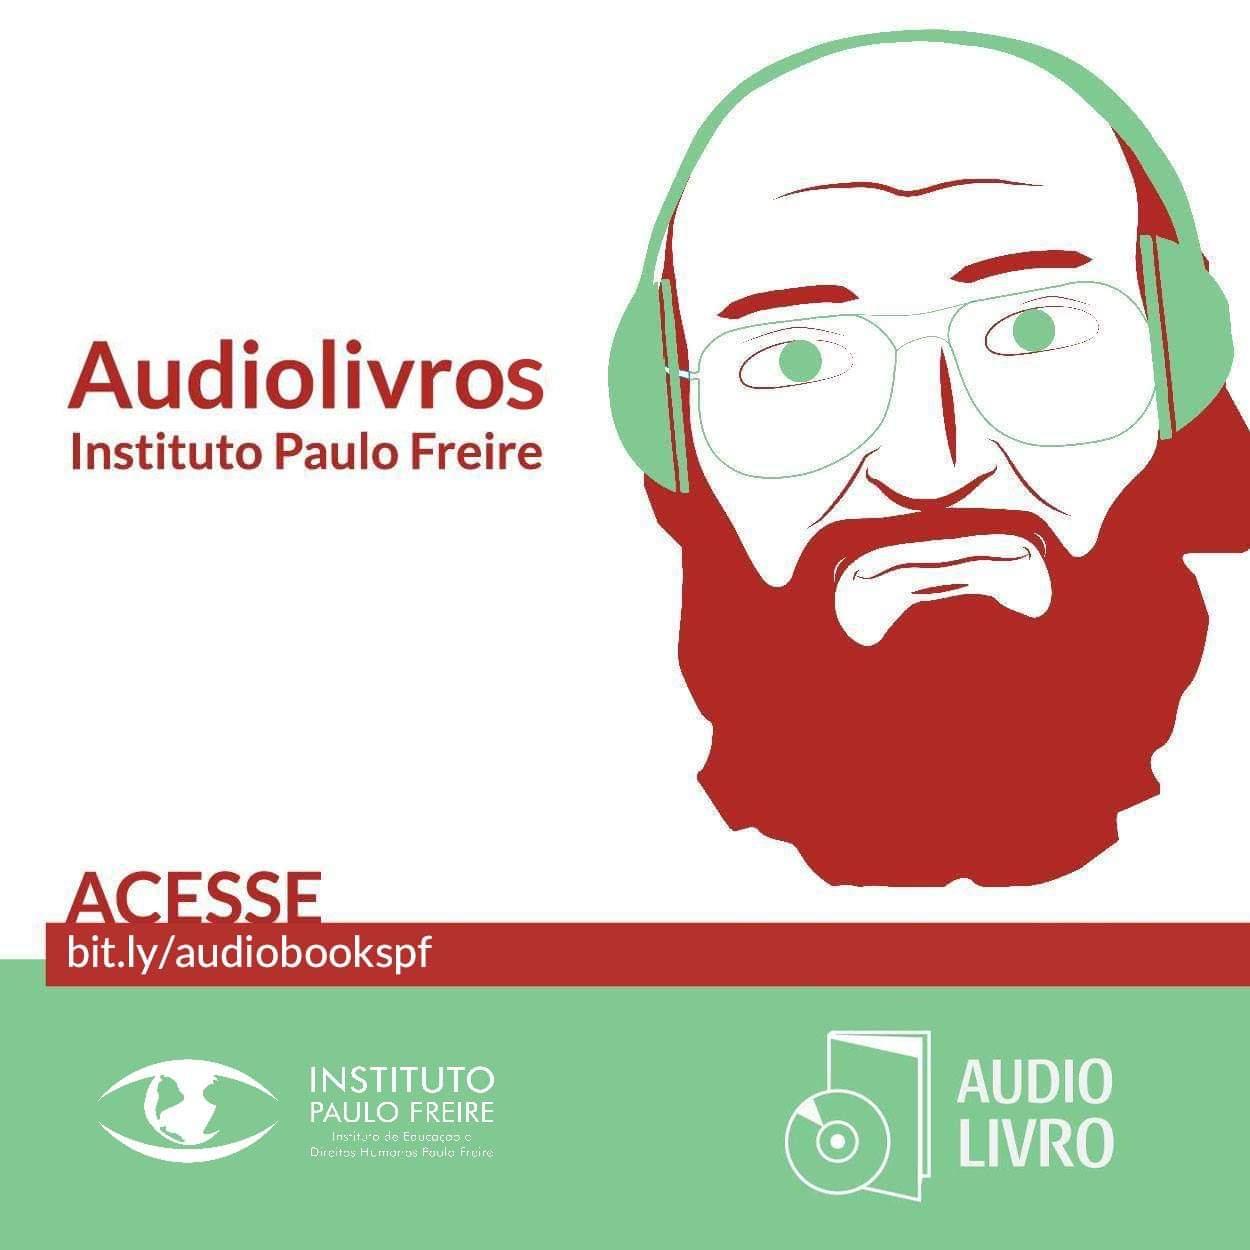 Audiolivrospb